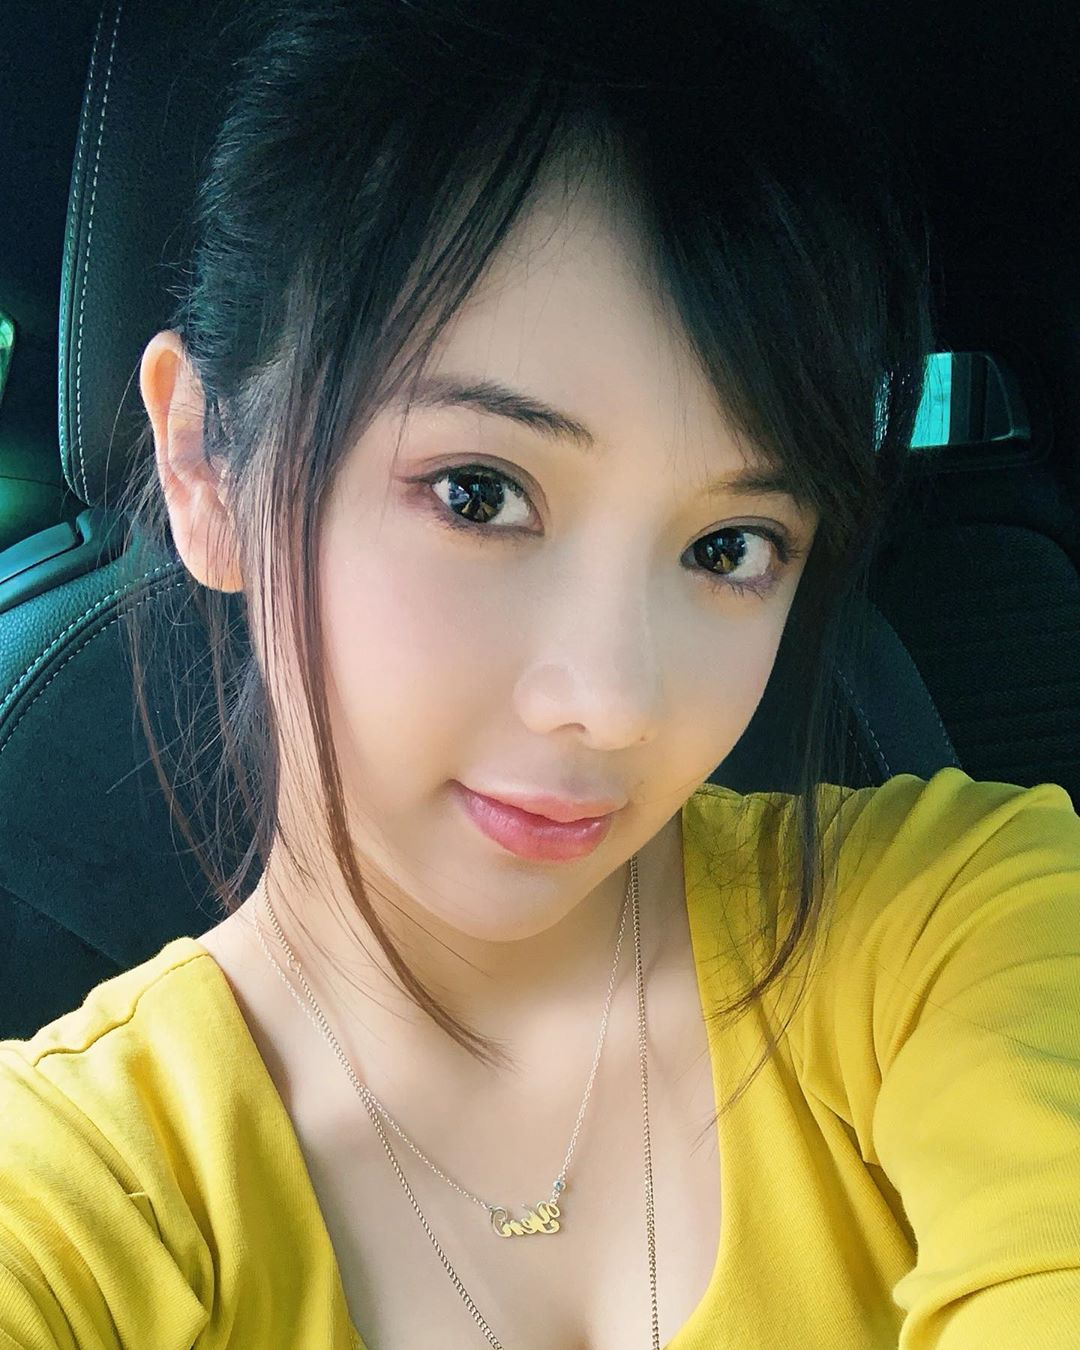 panaiyen_s Media_ 言酥雞:誰要上我車?.jpg